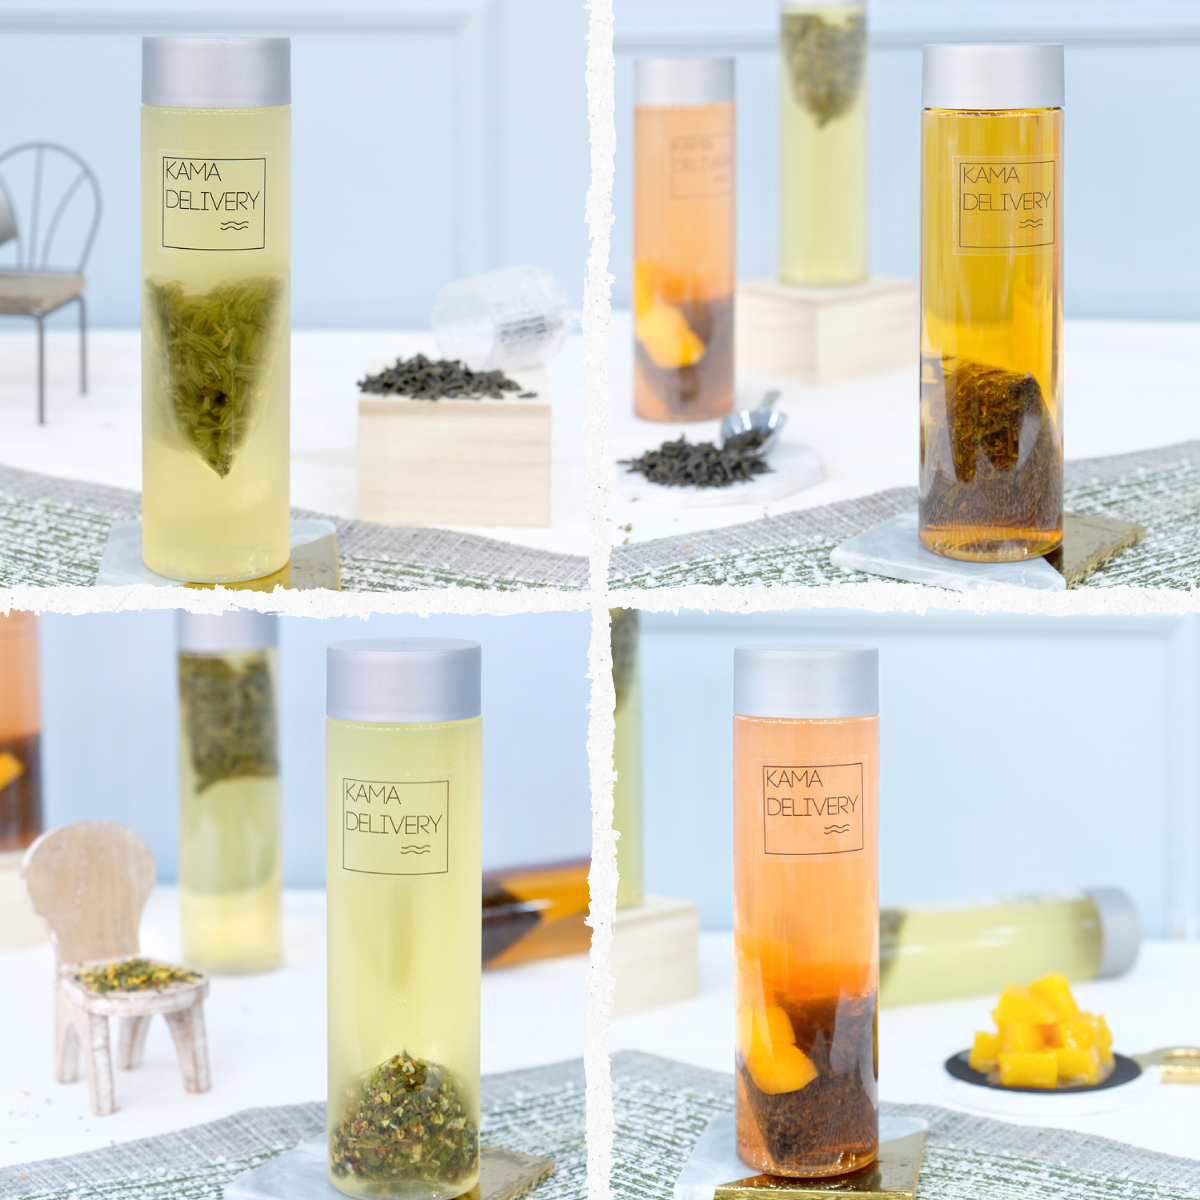 Kamadelivery推出的冷萃茶到會飲品系列